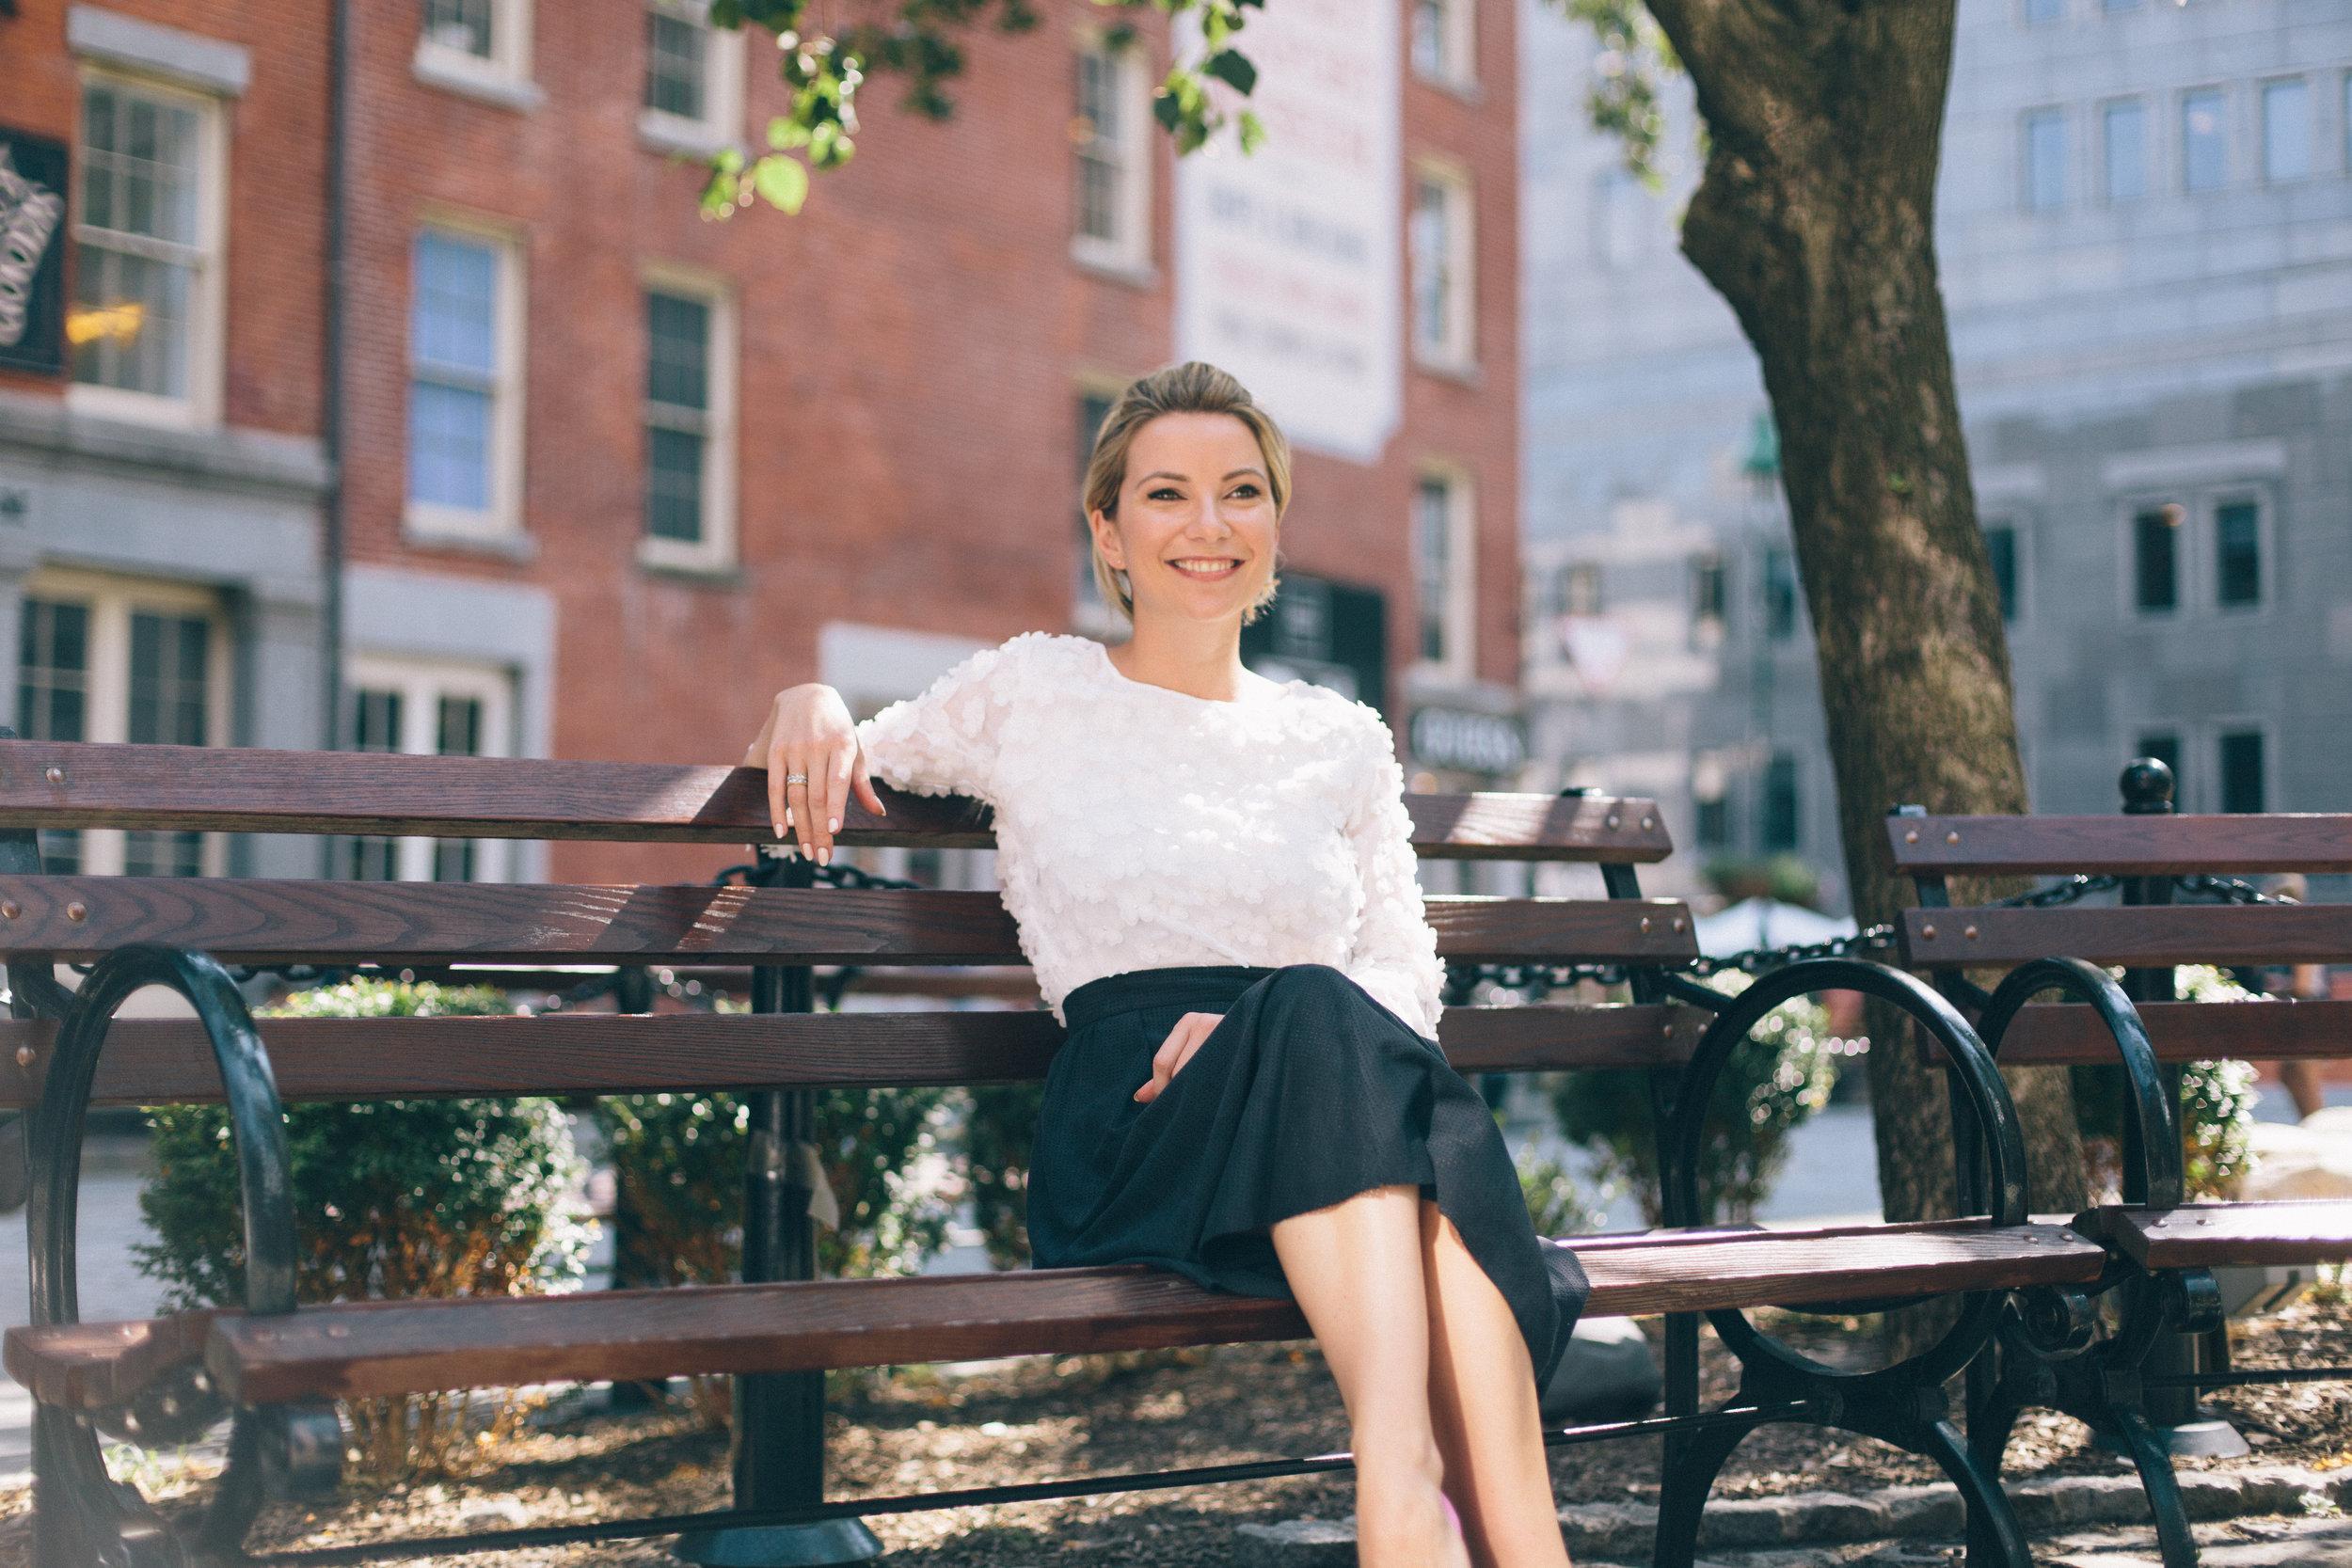 Meet Katherine - Website:https://www.katherineschafler.com/Newsletter:https://www.katherineschafler.com/hire-us/Instagram: @katherineschafler